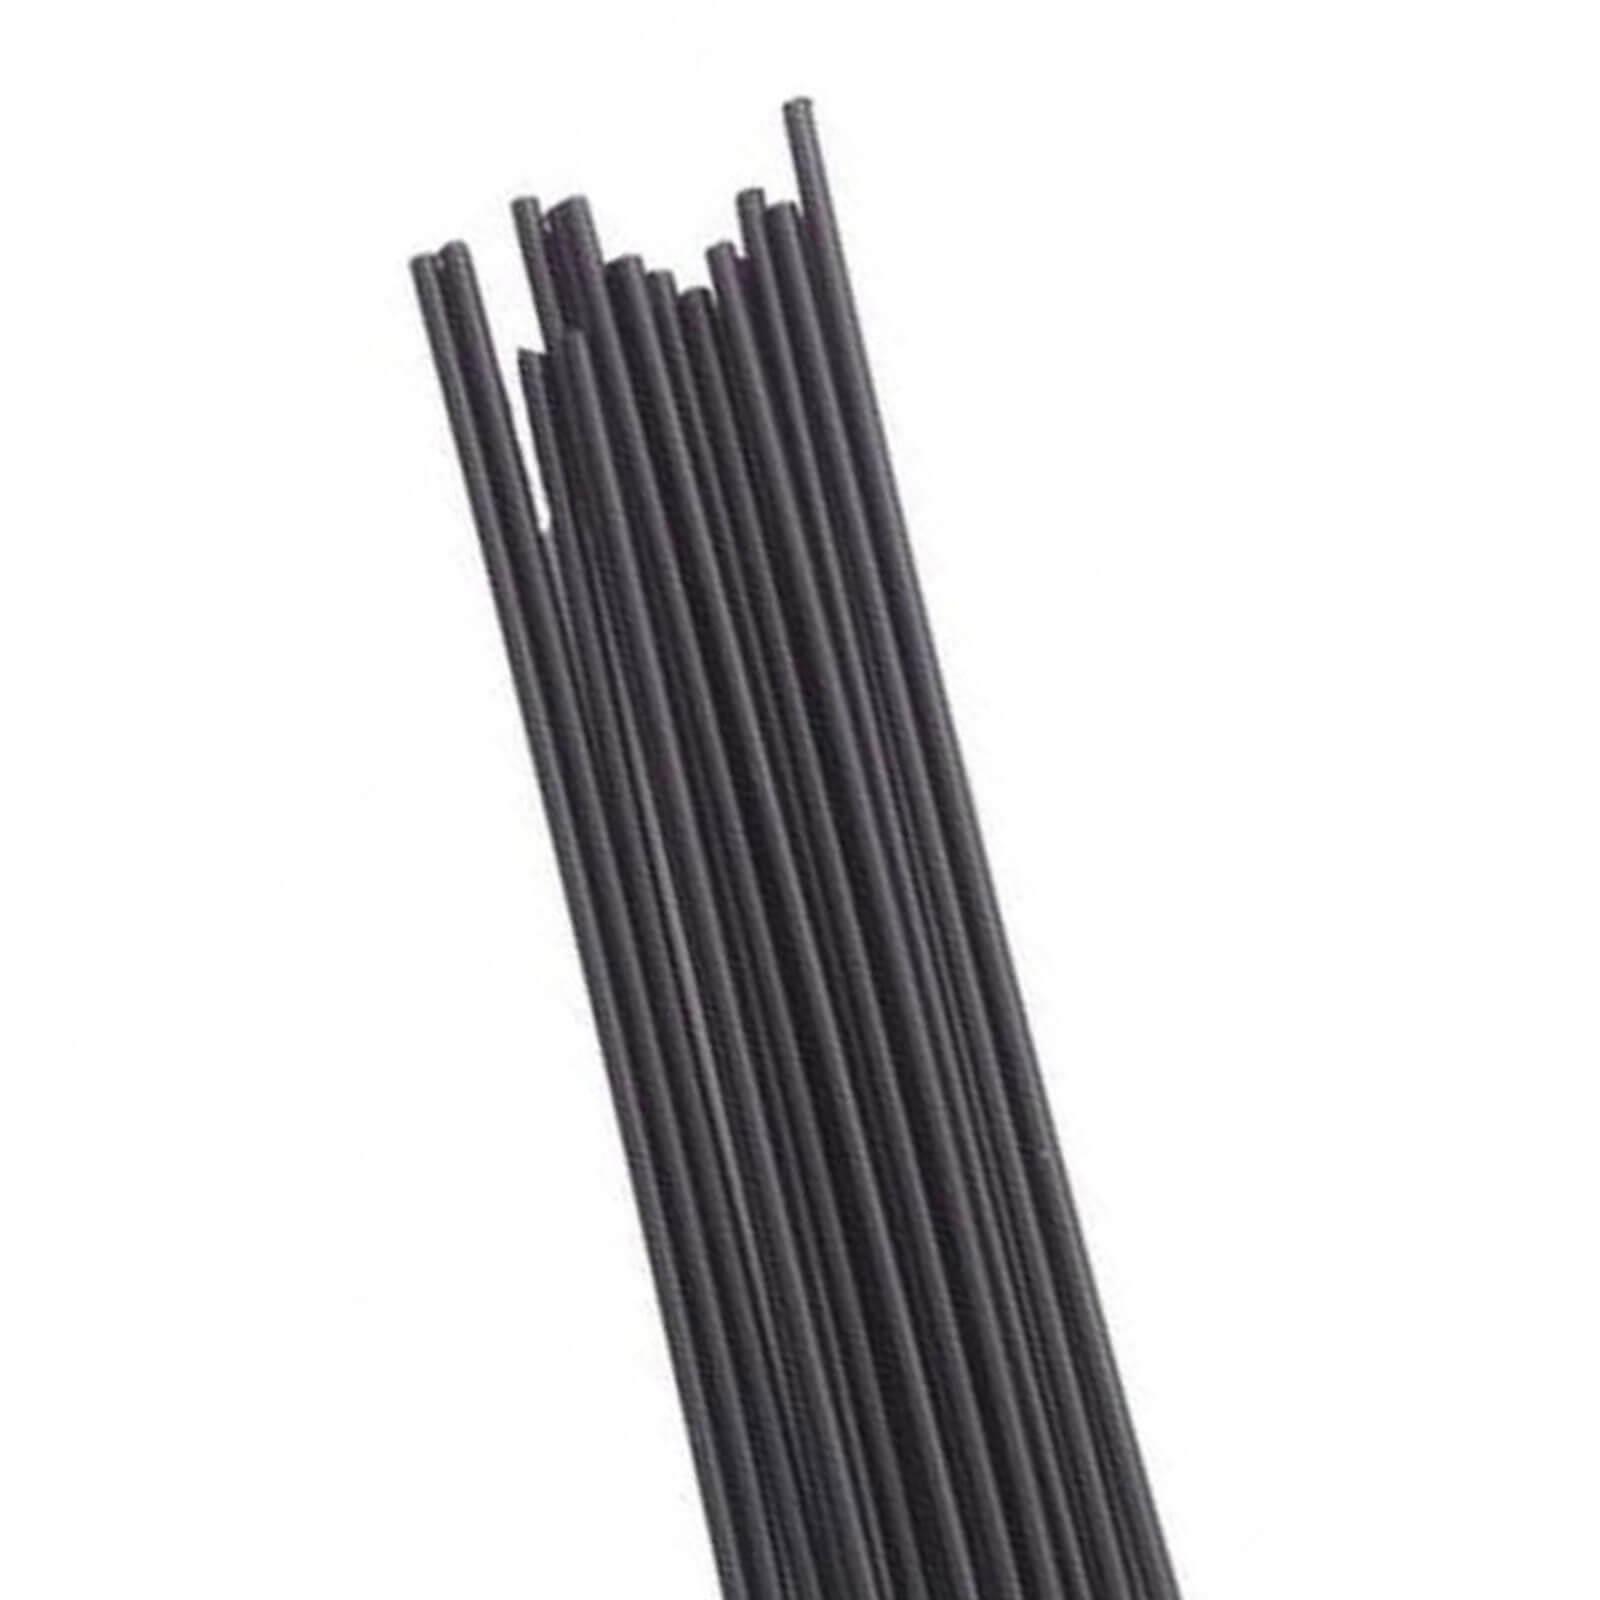 Image of Steinel ABS Plastic Heat Welding Rods 100g